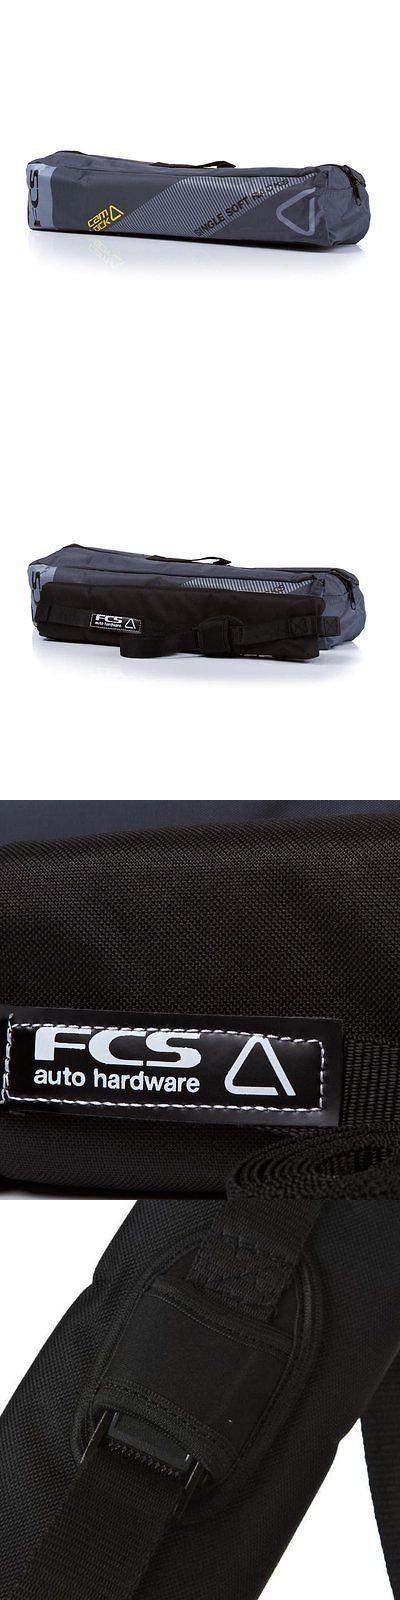 Car Racks 114254: Fcs Cam Lock Single Soft Surfboard Racks - Pair -> BUY IT NOW ONLY: $51.52 on eBay!